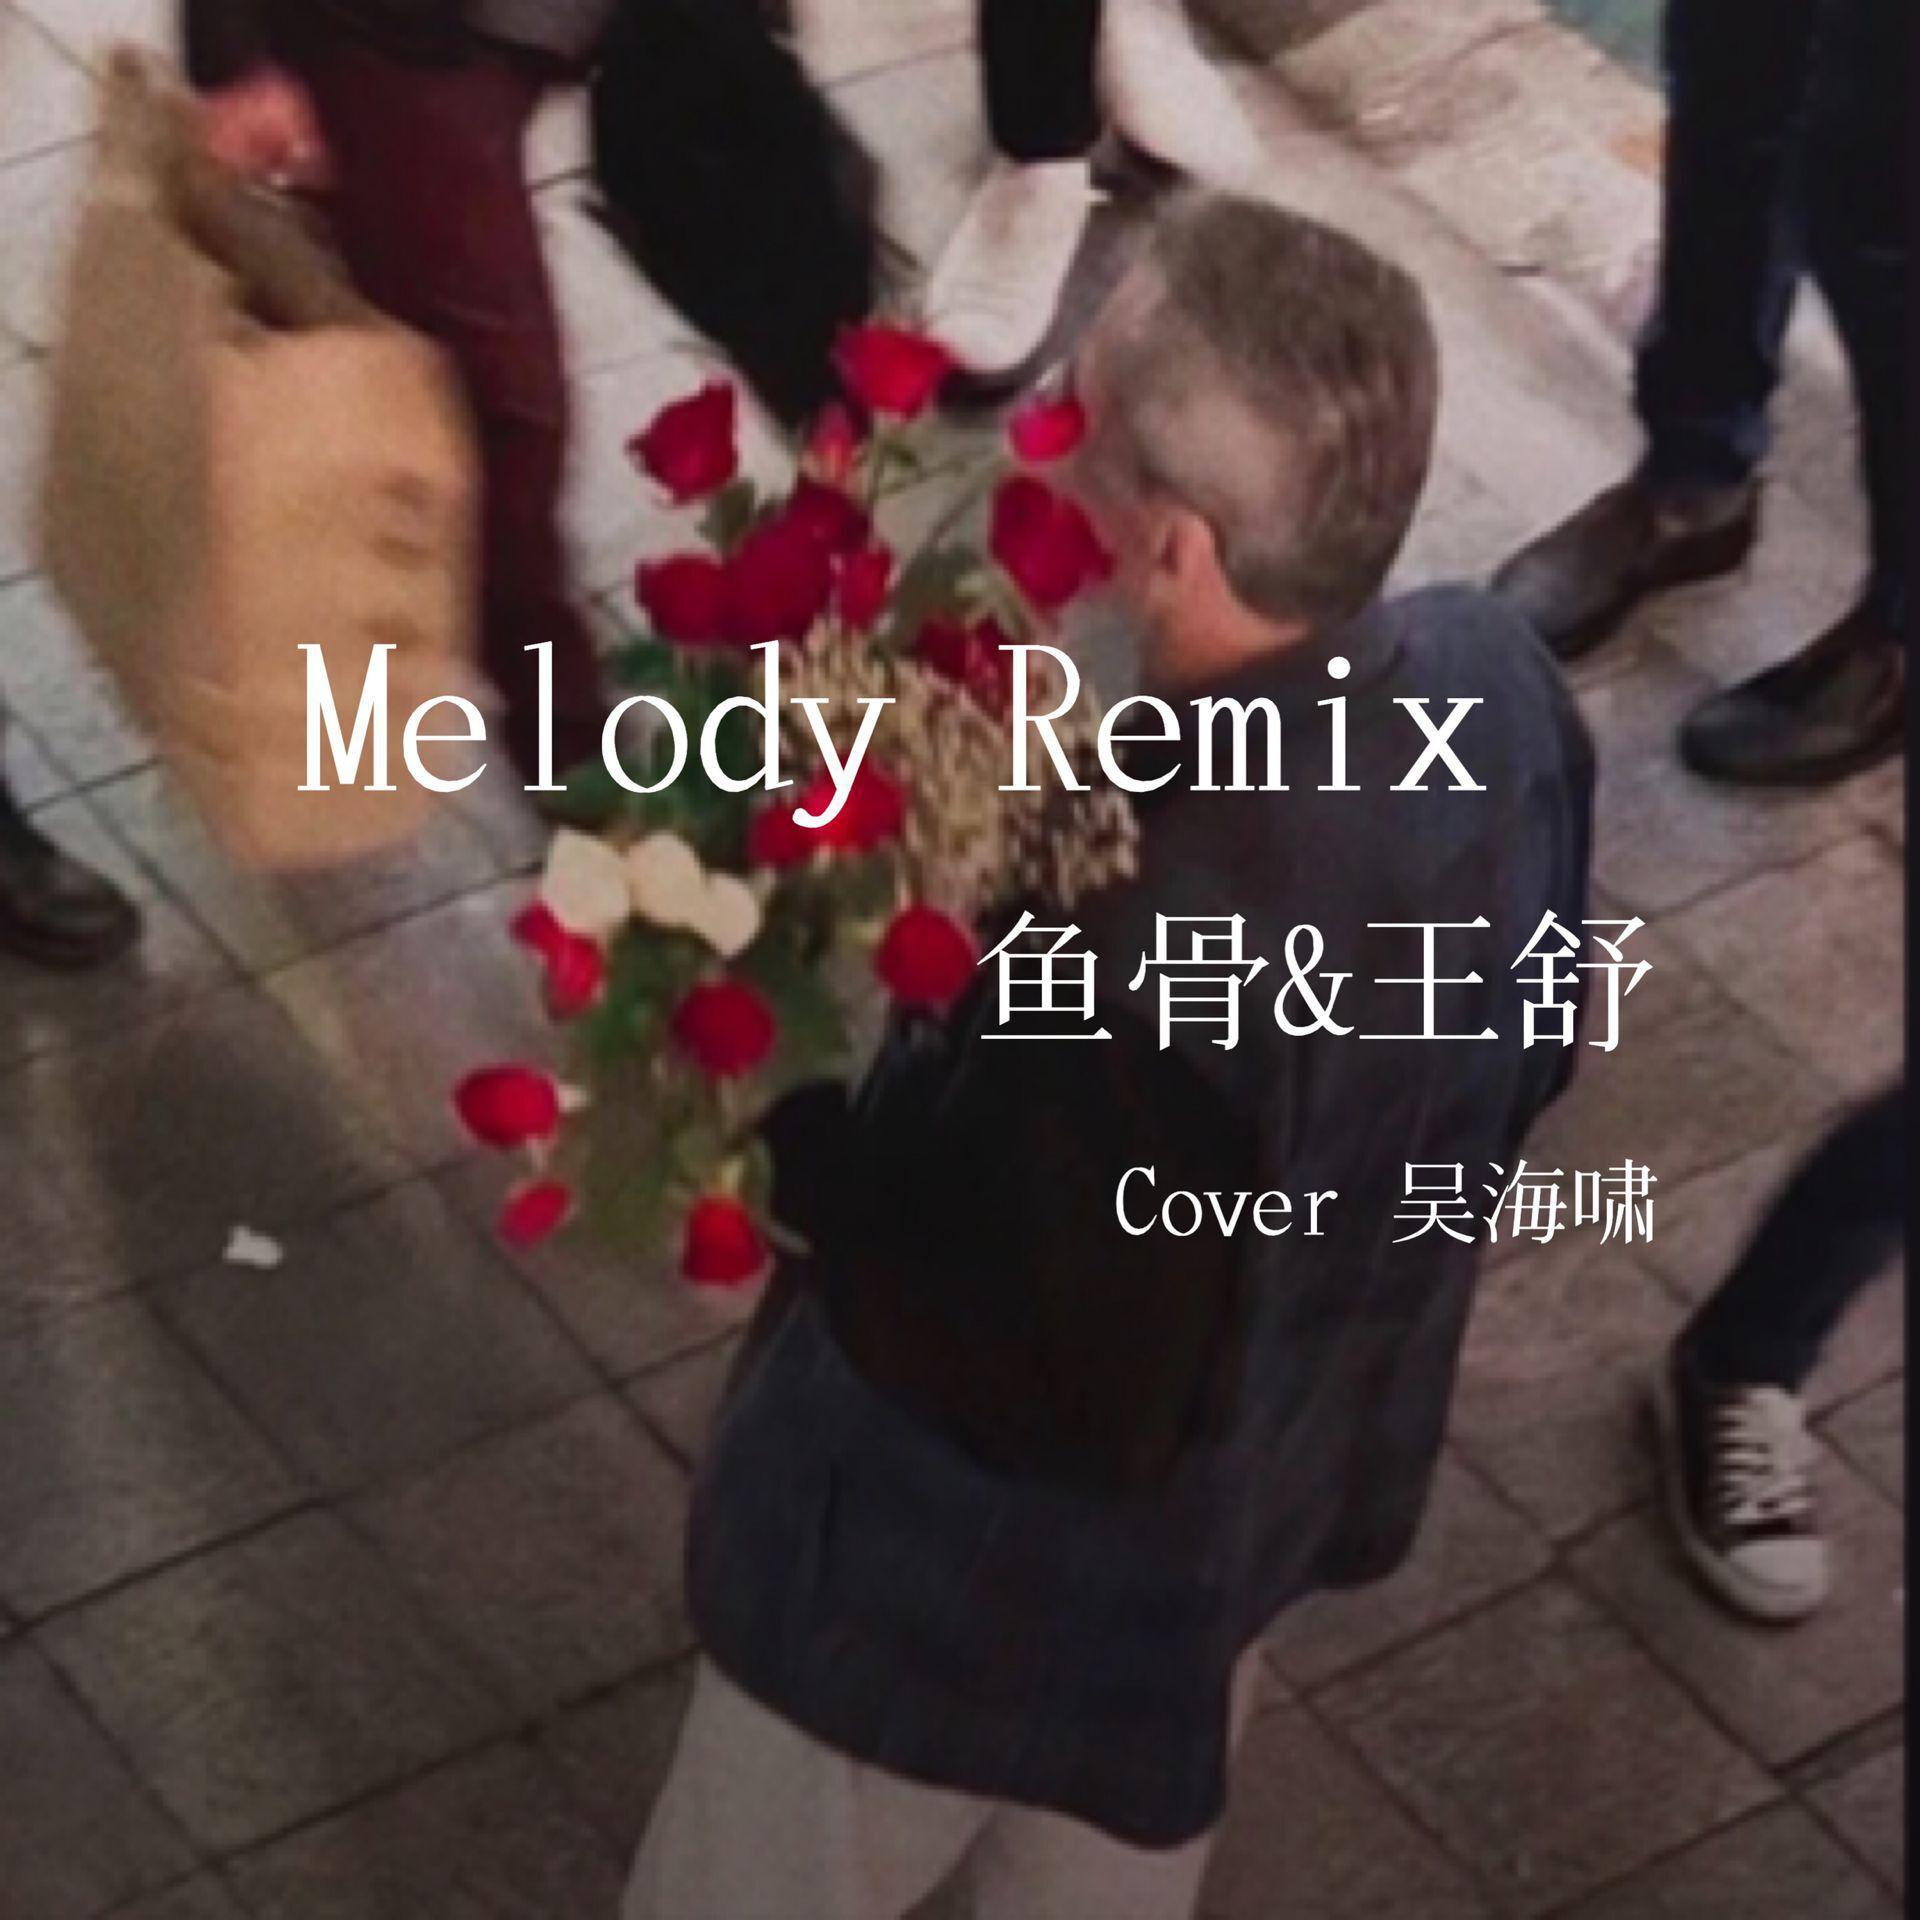 Melody Remix(翻自 吴海啸)